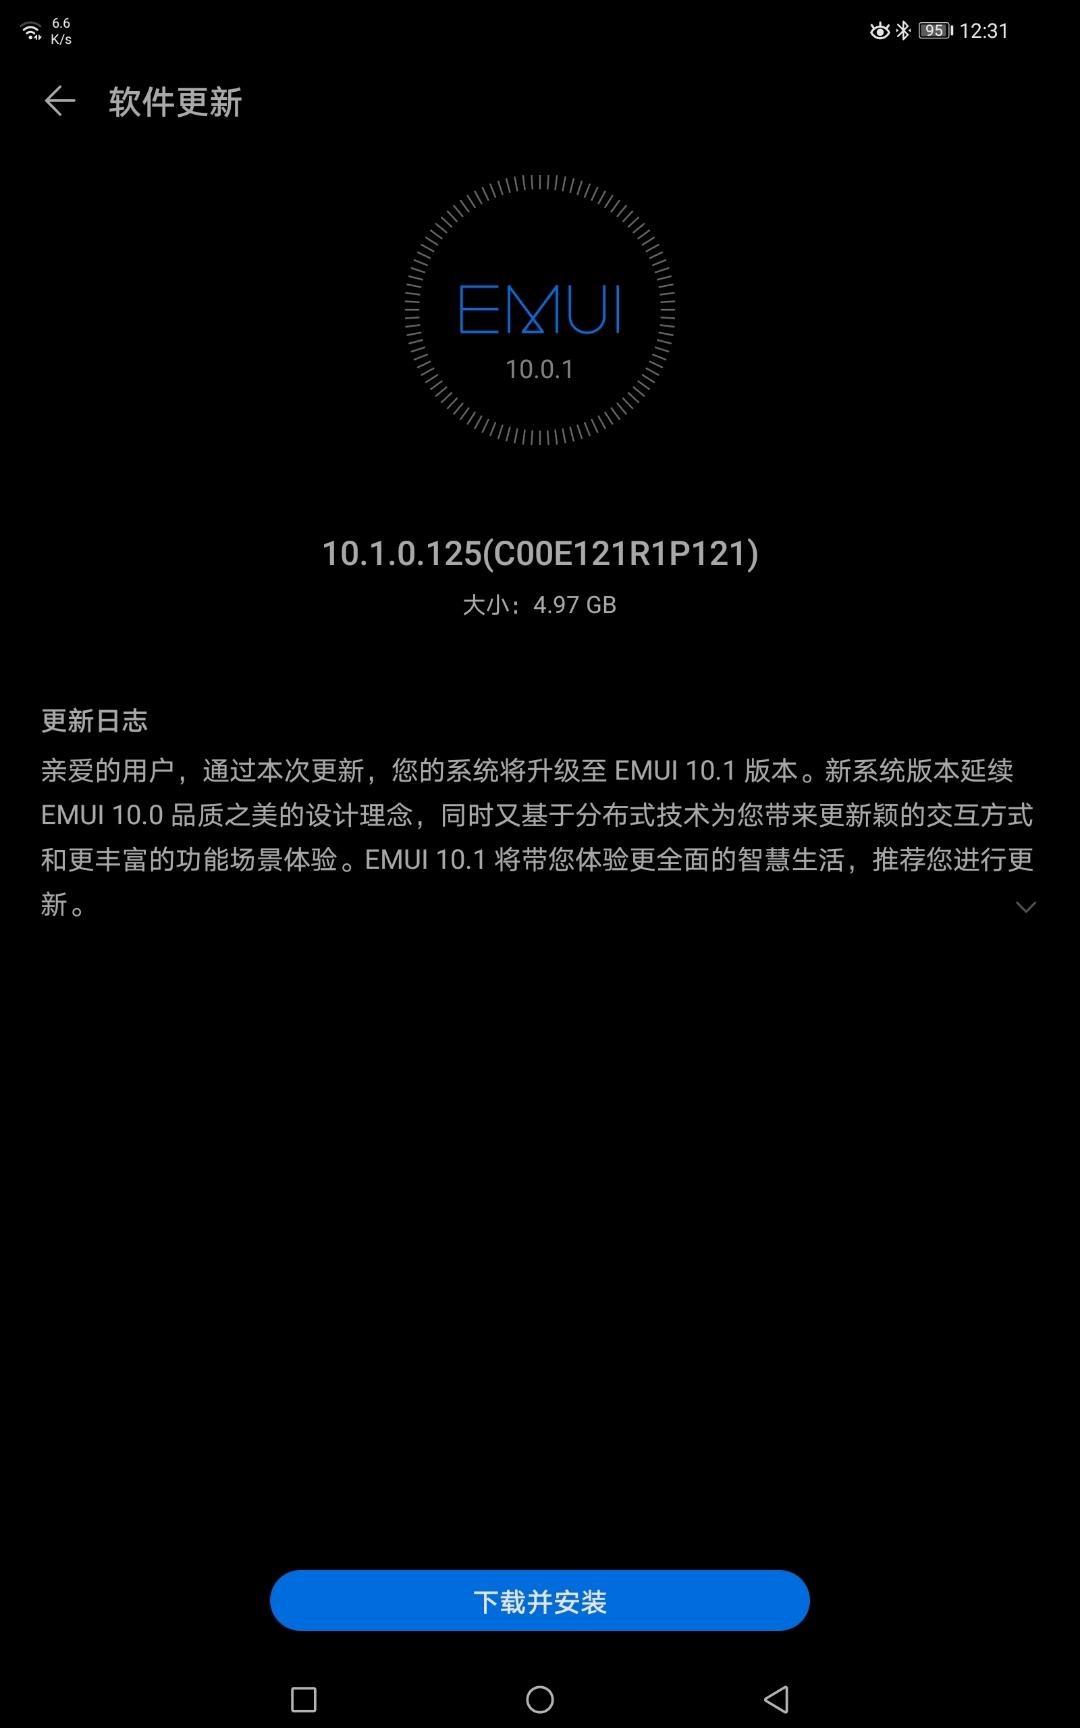 Screenshot_20200519_003137_com.huawei.android.hwouc.jpg